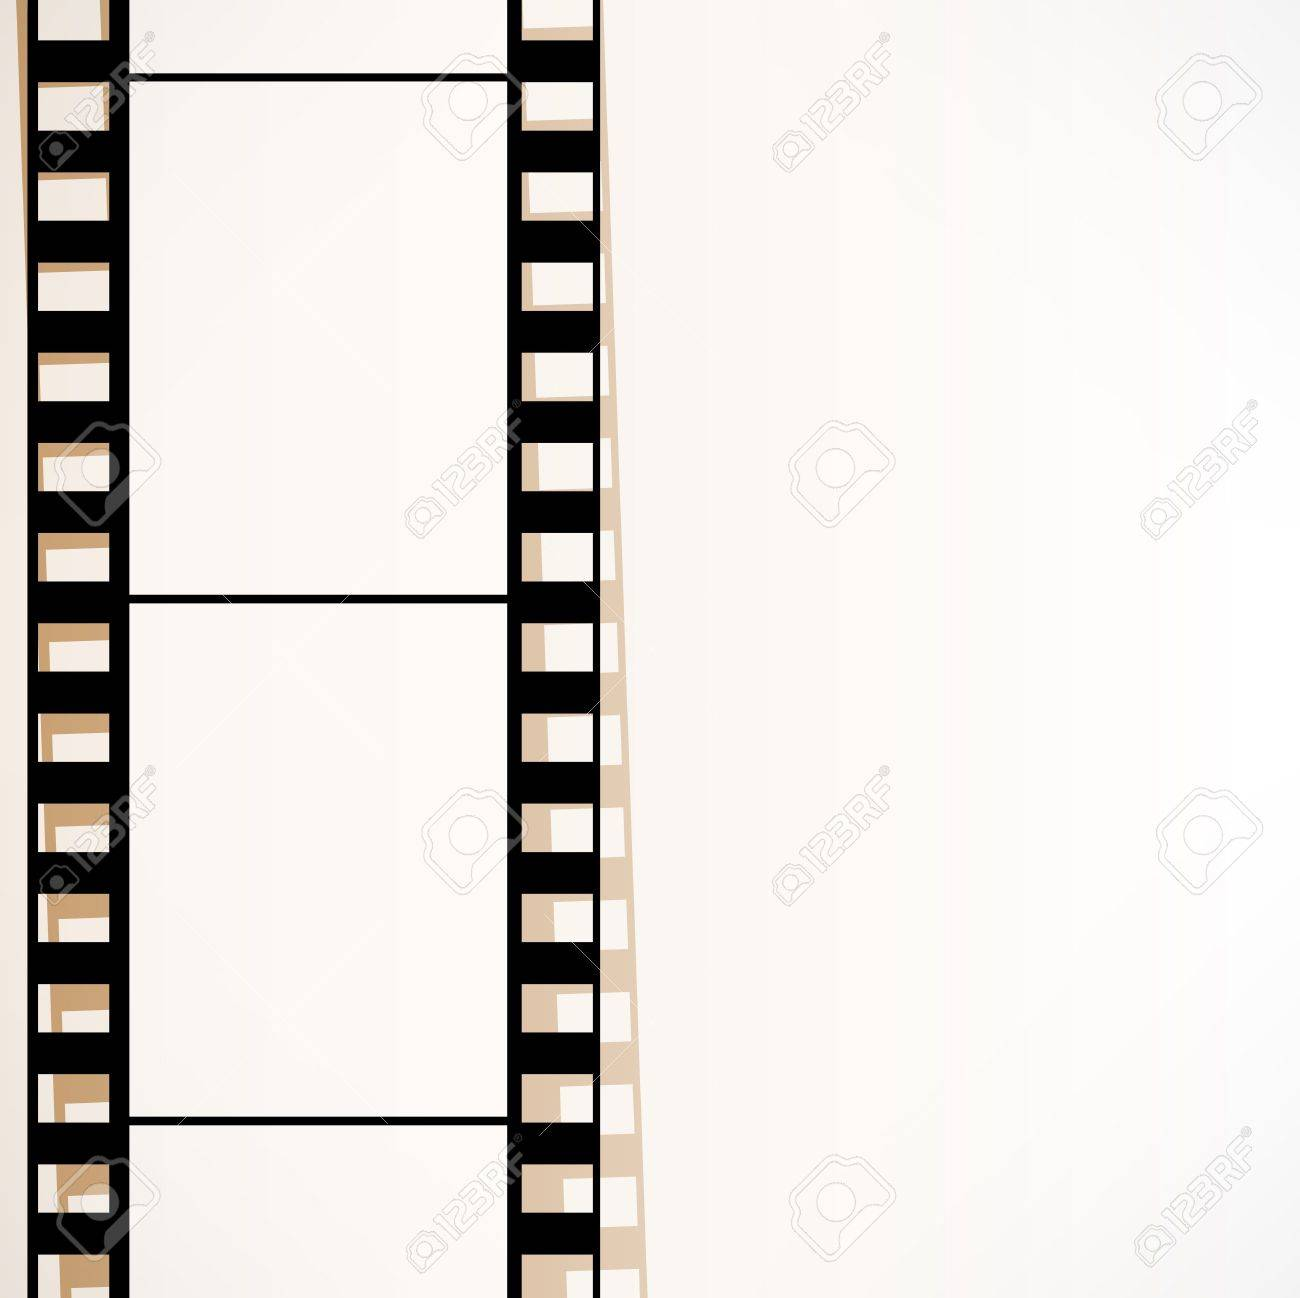 Old Filmstrip. Movie Ending Frame. Royalty Free Cliparts, Vectors ...